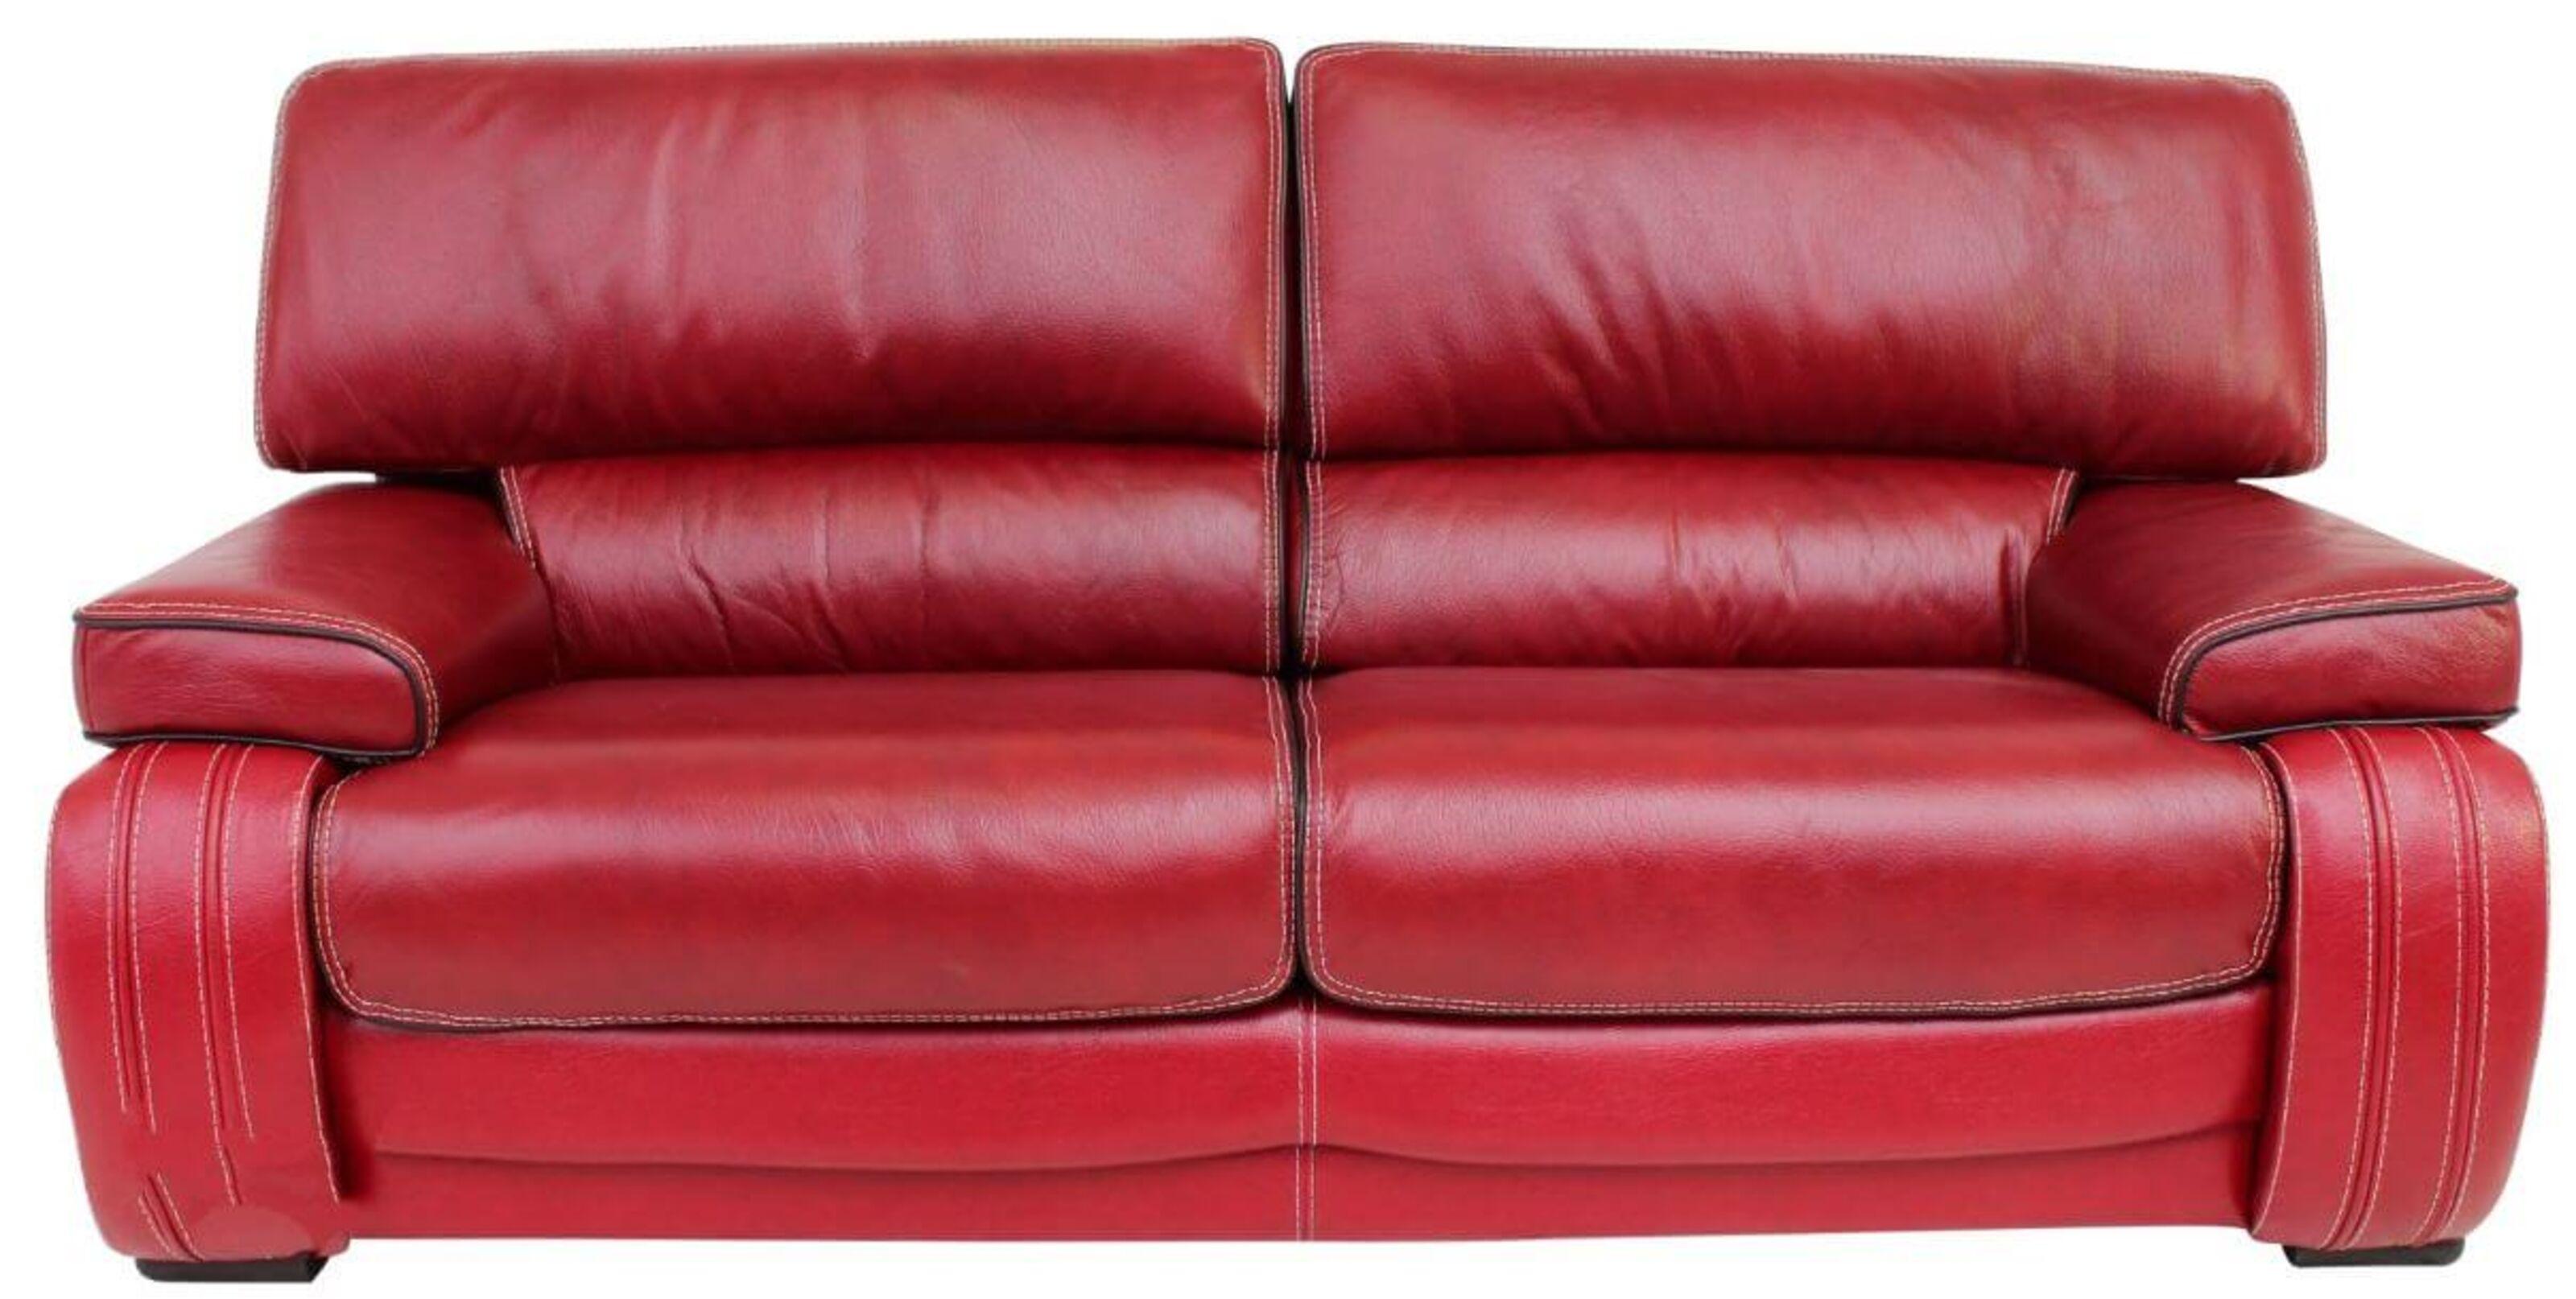 Firenze Italian Leather Sofa Settee